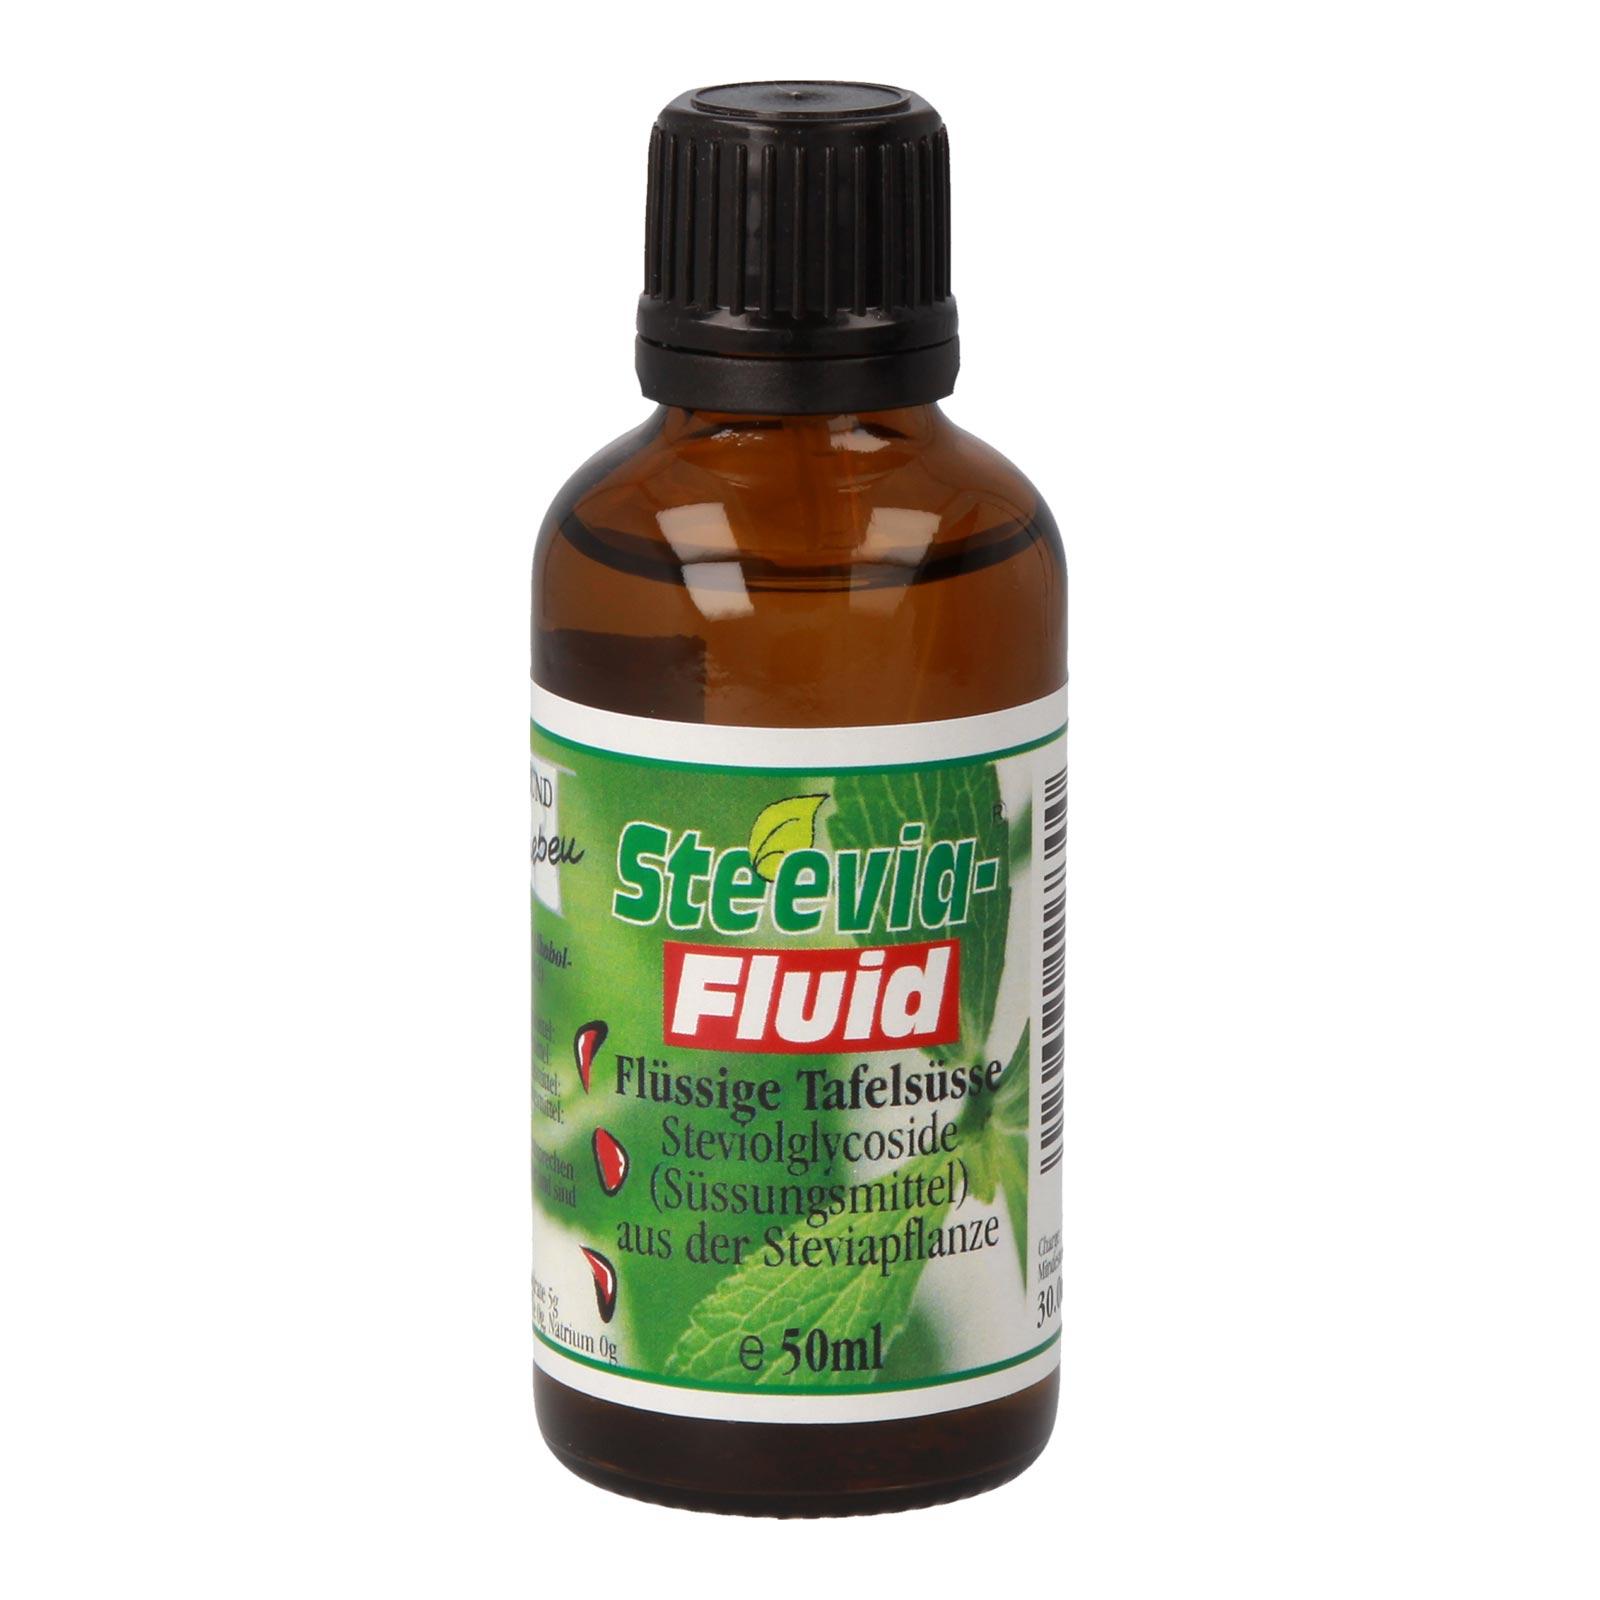 stevia fluid extrakt kaufen fl ssige s e purenature. Black Bedroom Furniture Sets. Home Design Ideas